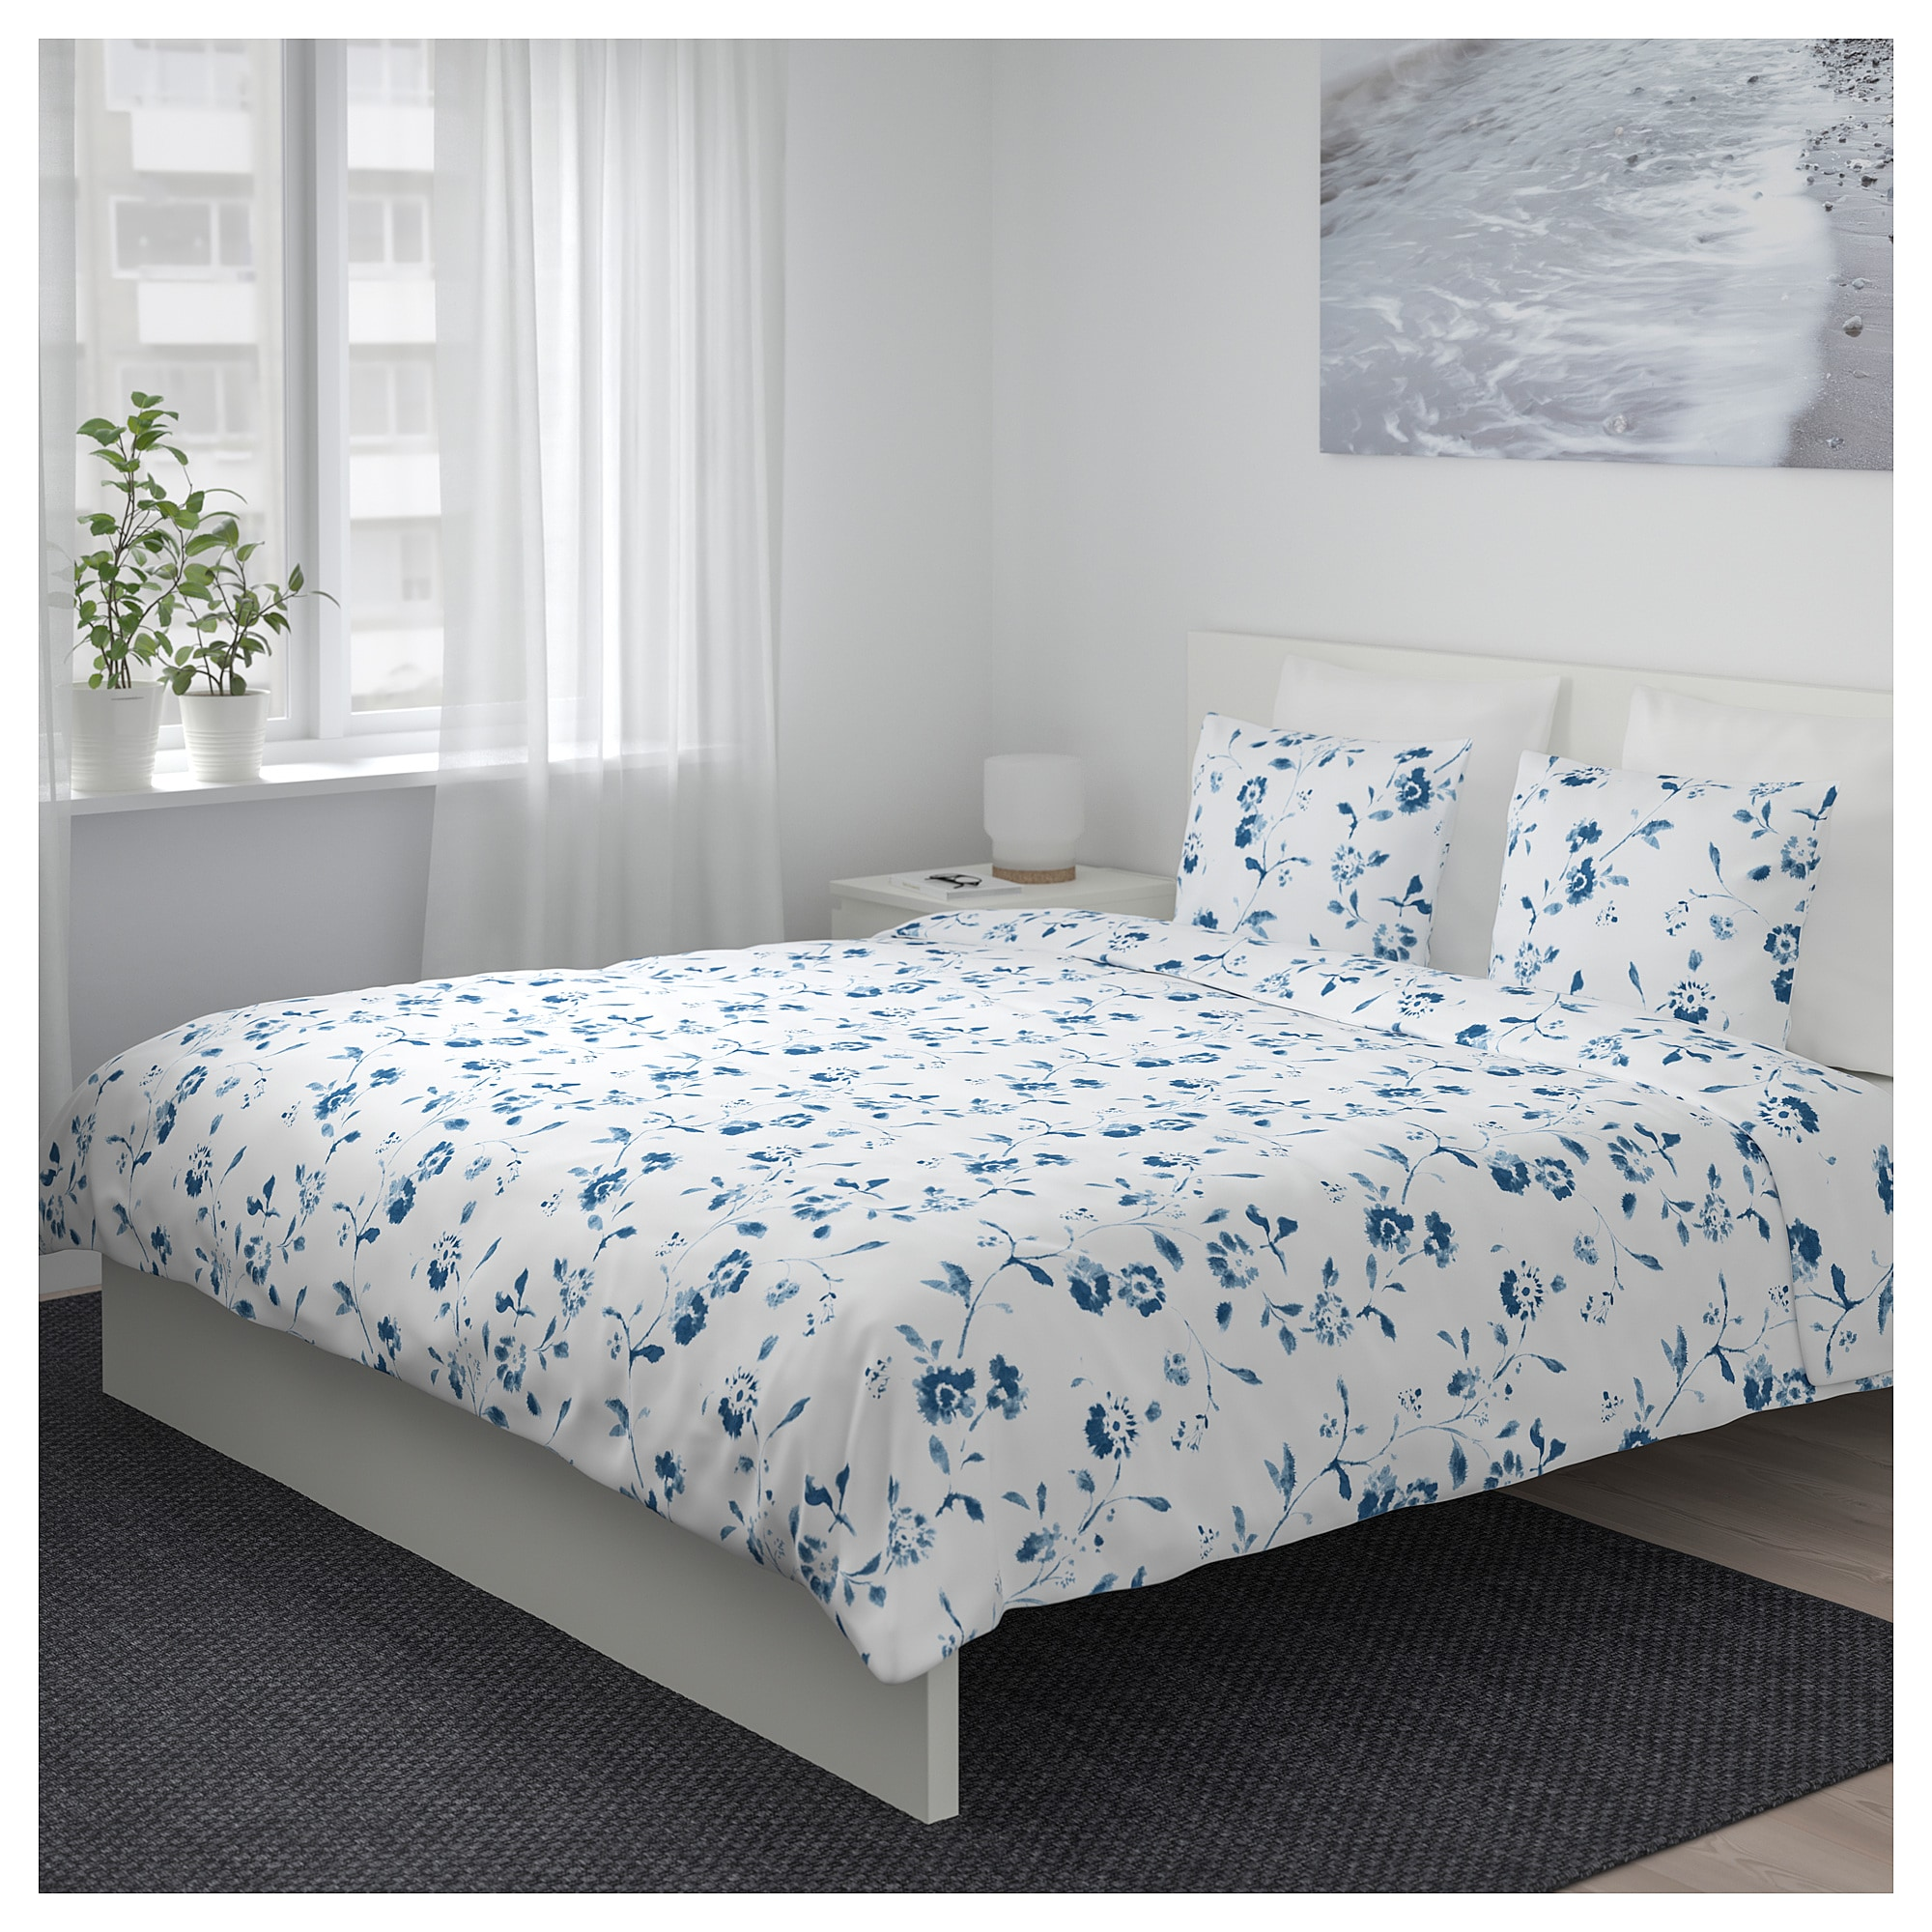 IKEA BLÅGRAN Duvet cover and pillowcase(s) white, blue